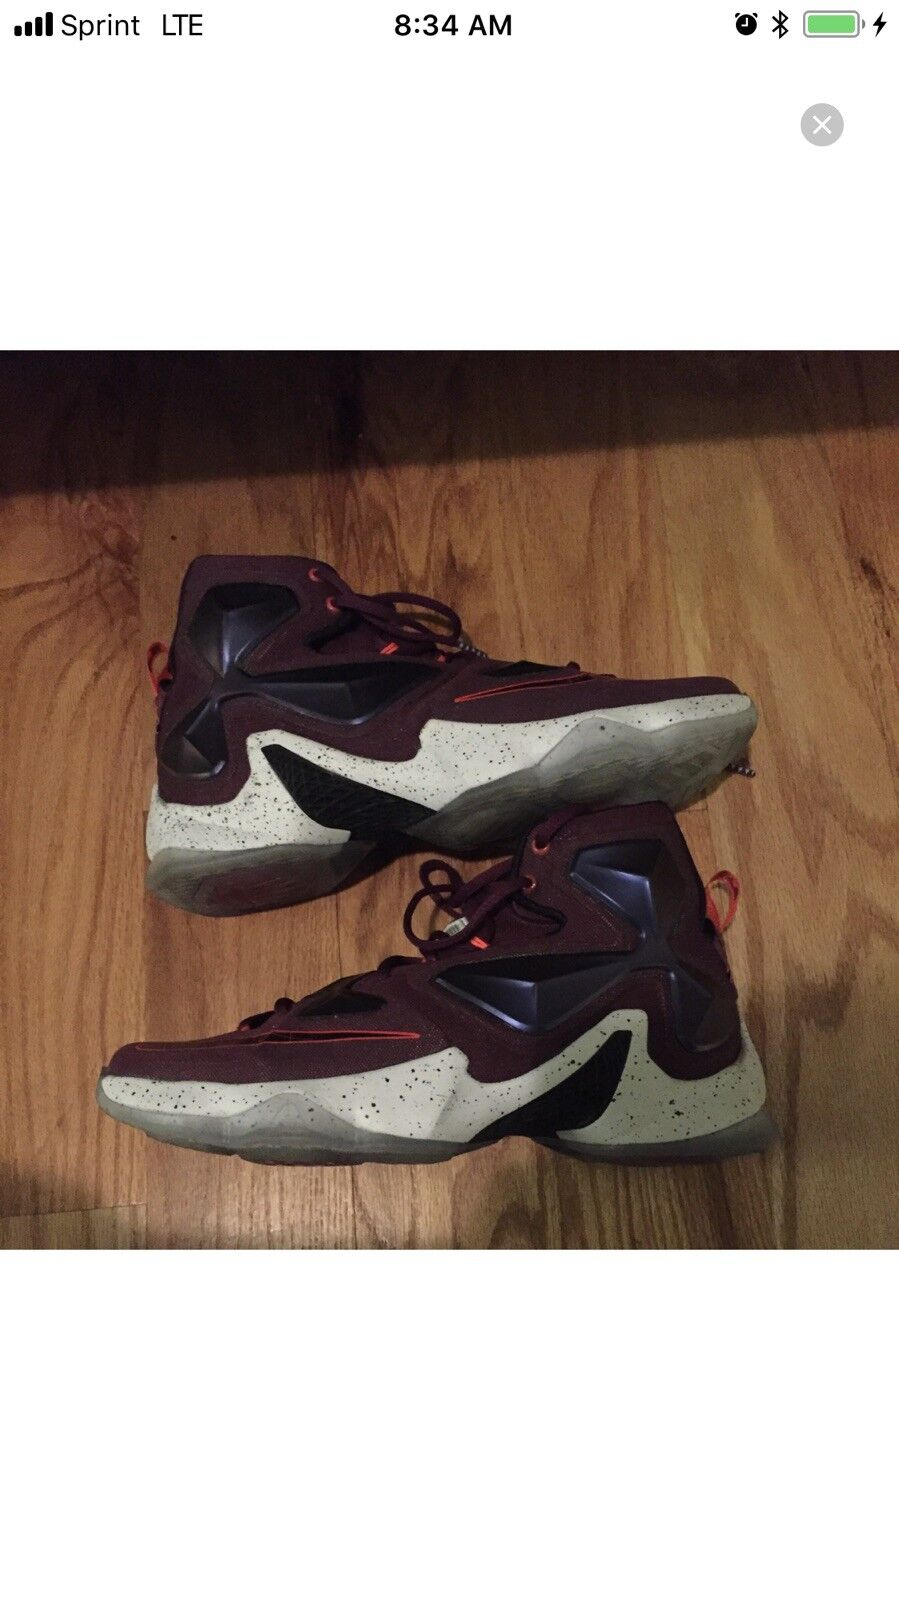 factory authentic c5635 ec642 Nike Lebron Lebron Lebron XIII 13 Berry Sz. 10 7708e0